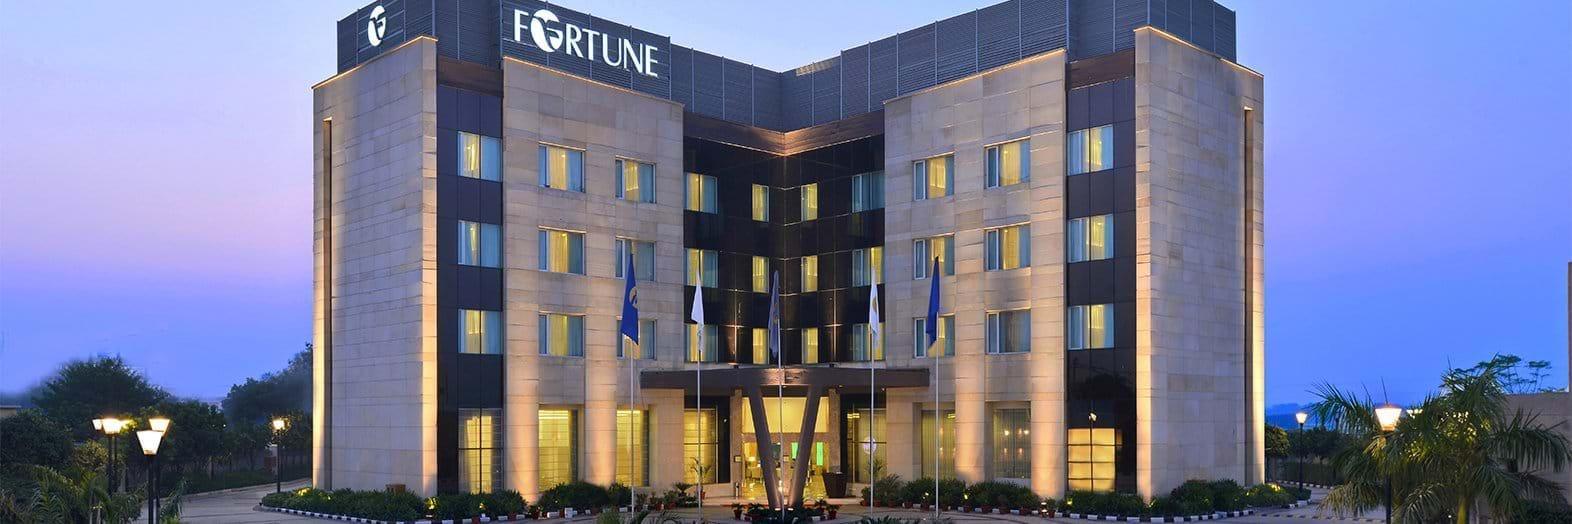 Gurgaon Fortune Park Orange Sidhrawali Fortune Hotels